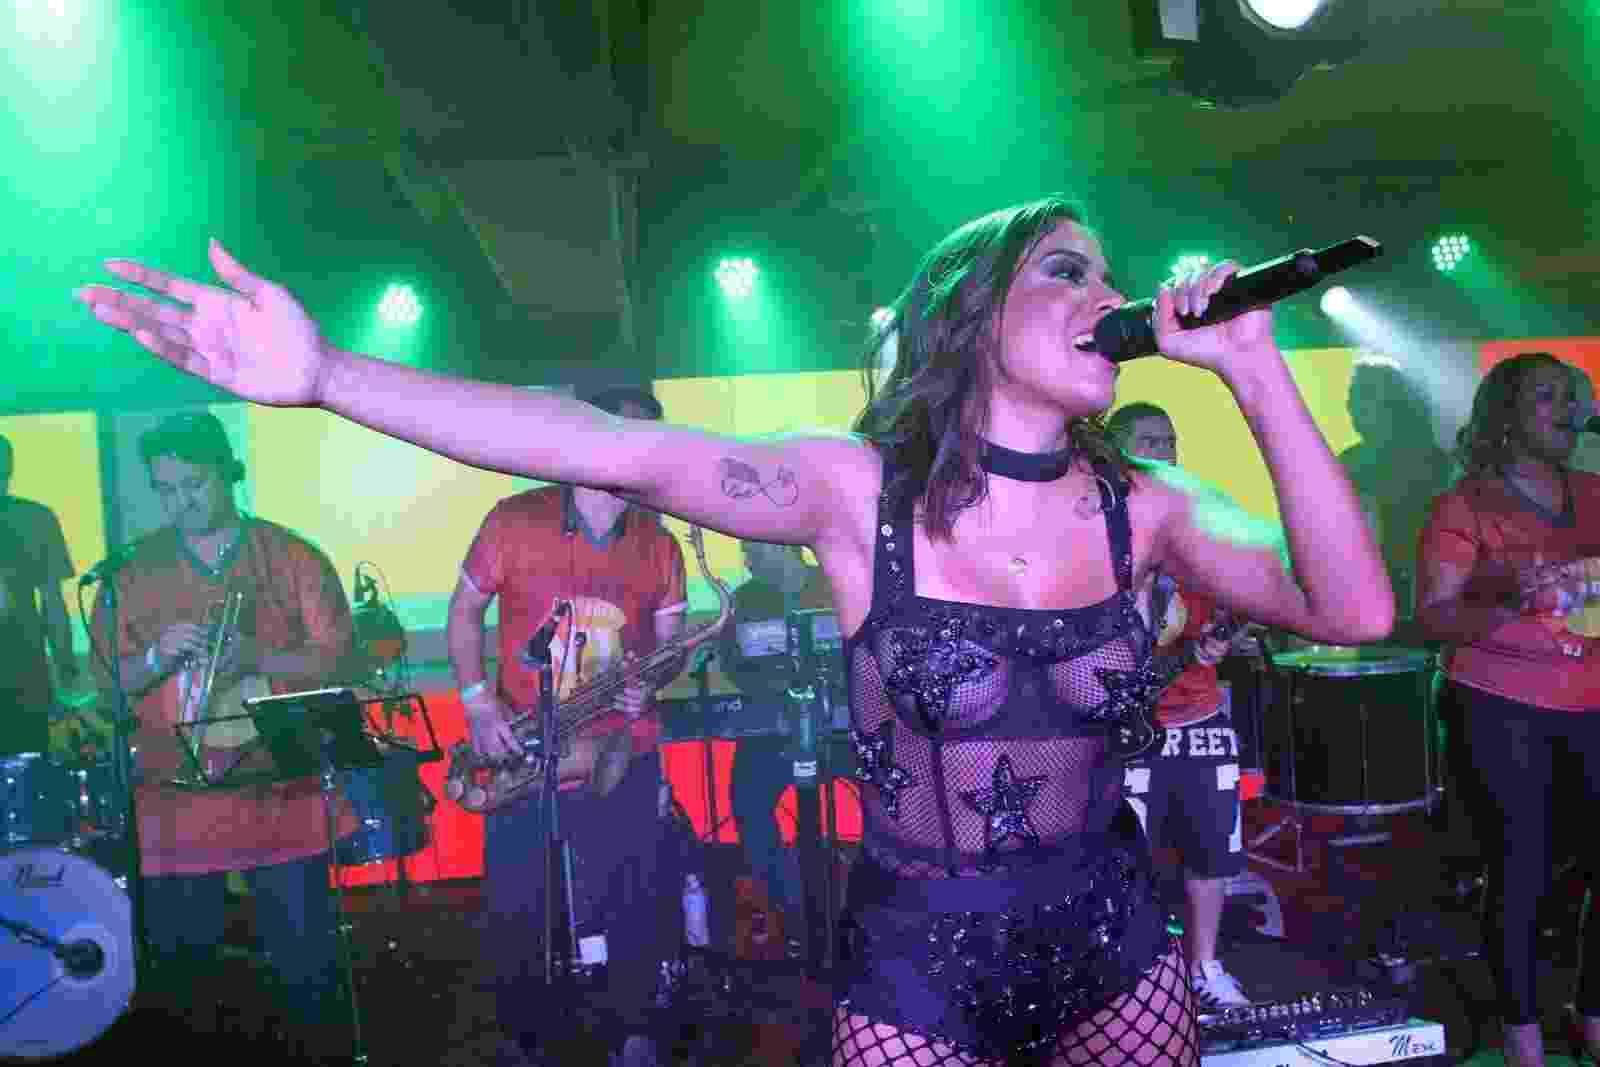 4.mar.2017 - Anitta se apresenta durante o Desfile das Campeãs do Rio no camarote N1, na Sapucaí - Thyago Andrade/Brazil News